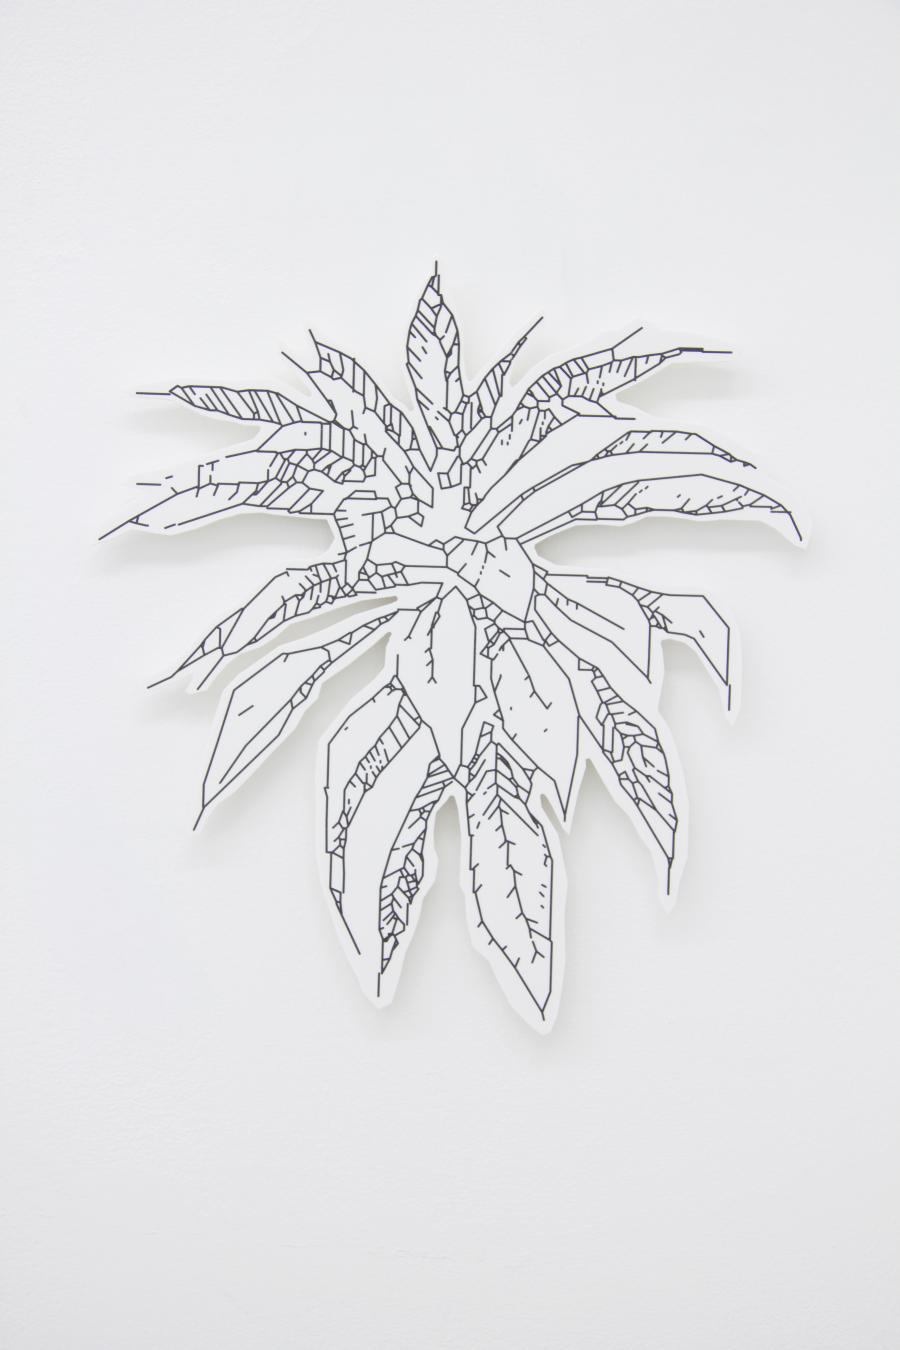 Richard Nikl, Plant 1:1, UV-print on PVC, 39 x 42 cm, 2015